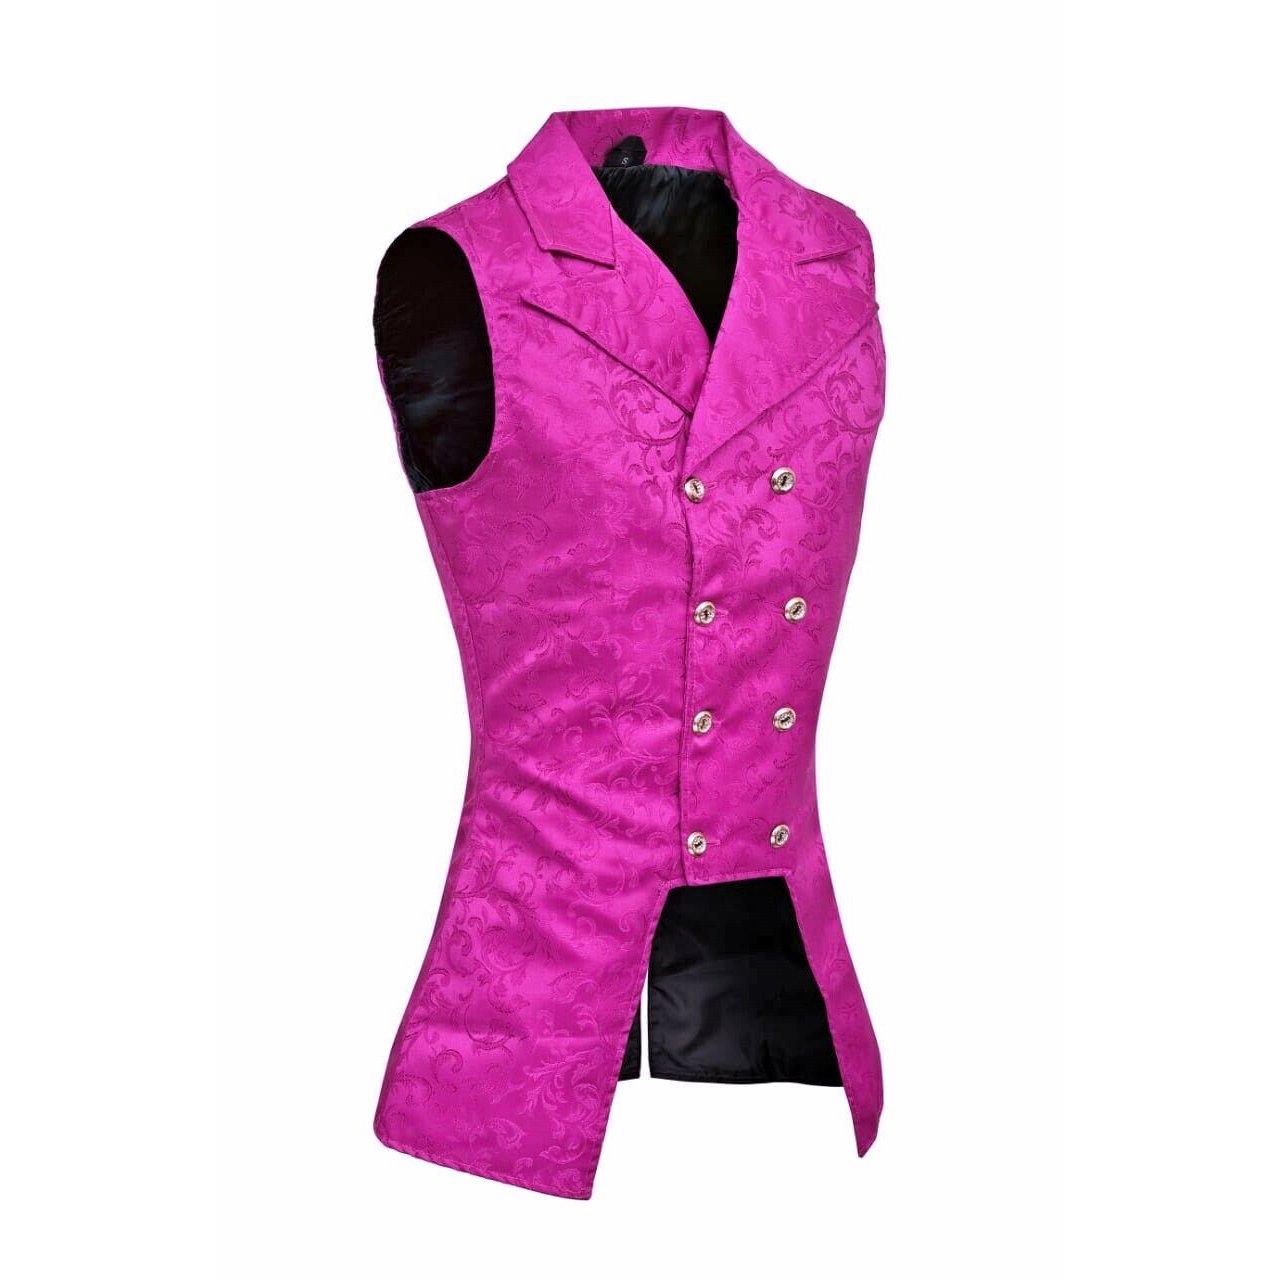 DARKROCK Purple Double Breasted GOVERNOR Vest Waistcoat VTG Brocade Gothic Steampunk(side)